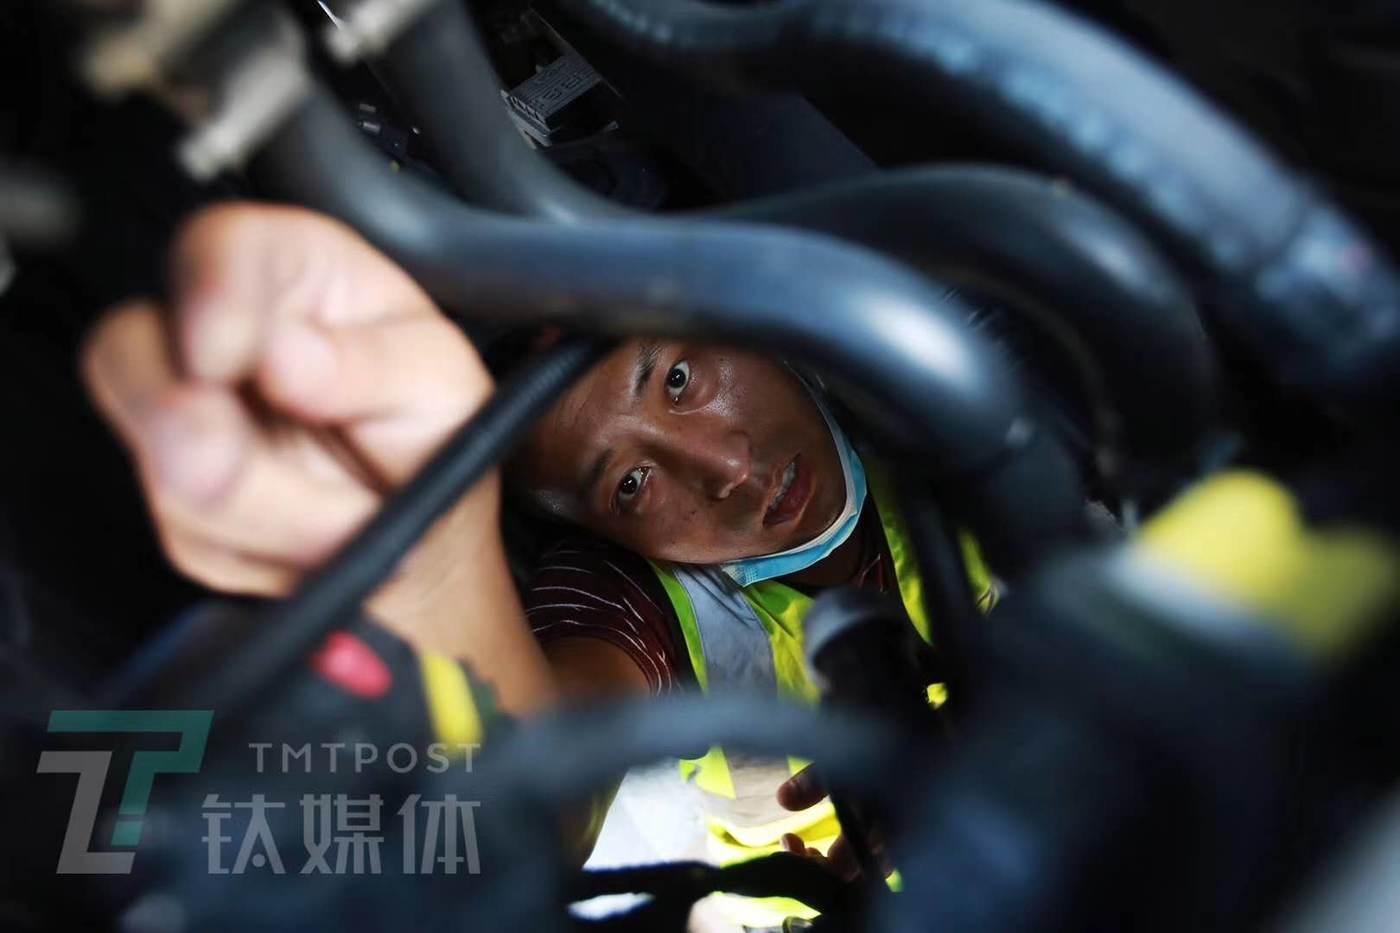 G7工程师正在一台沃尔沃挂车头上安装双防设备